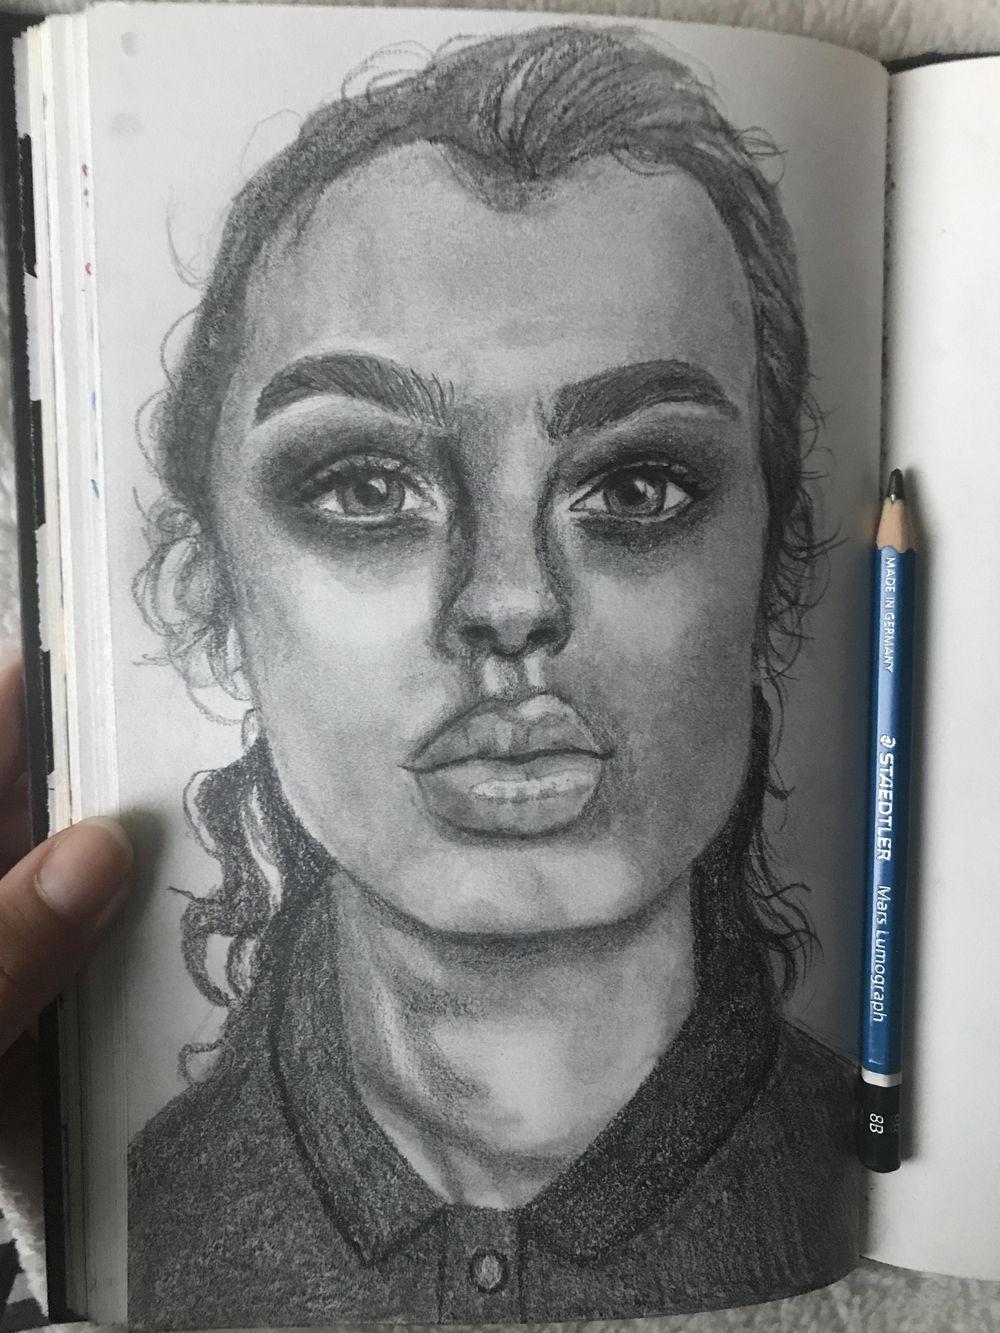 Portrait + sketches! - image 4 - student project